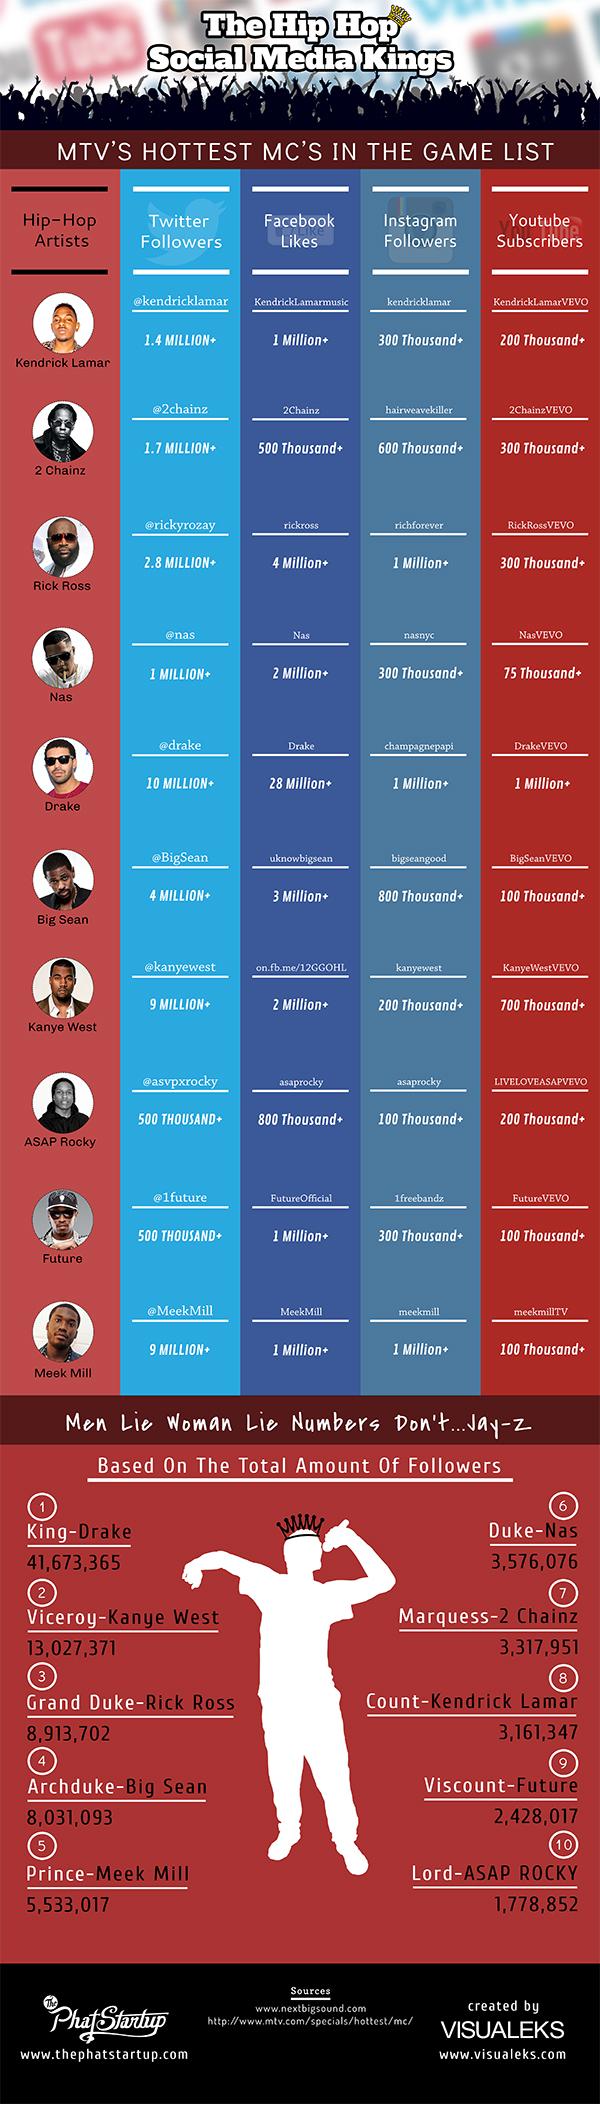 The Hip Hop Social Media Kings